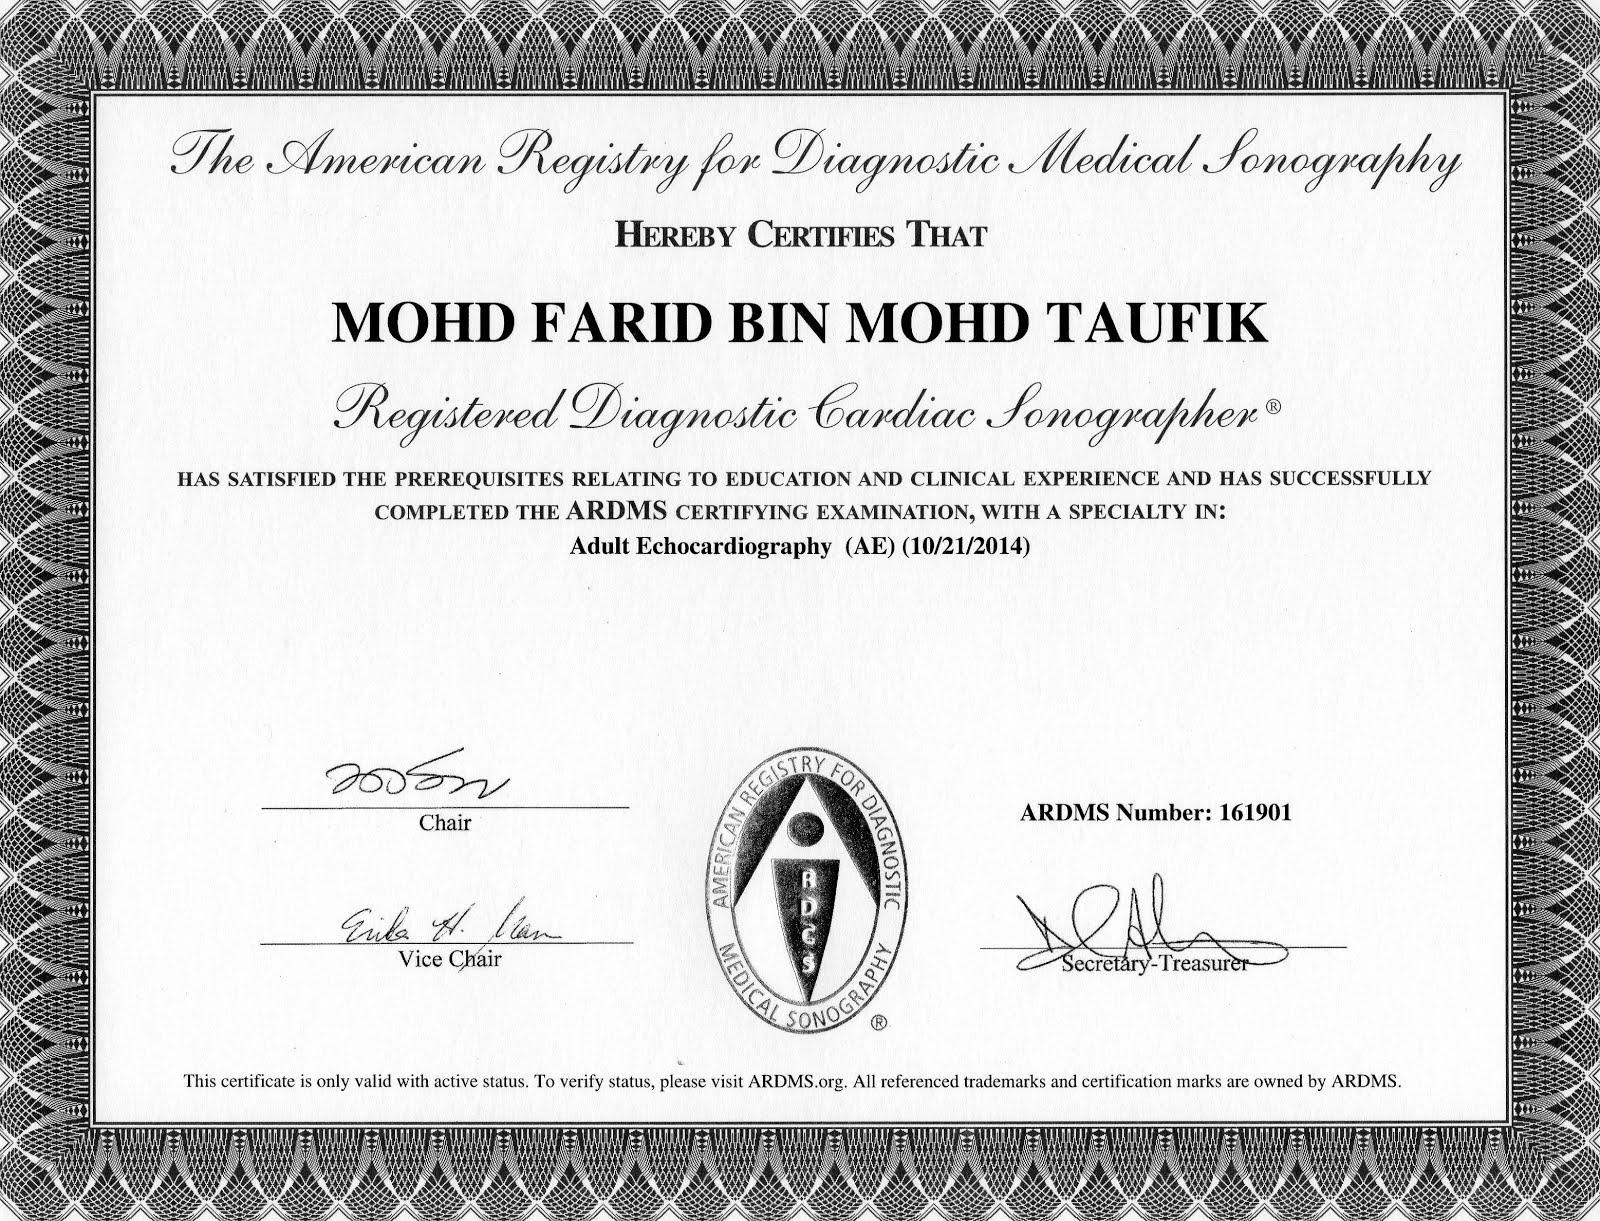 Registered Diagnostic Cardiac Sonographer (RDCS)